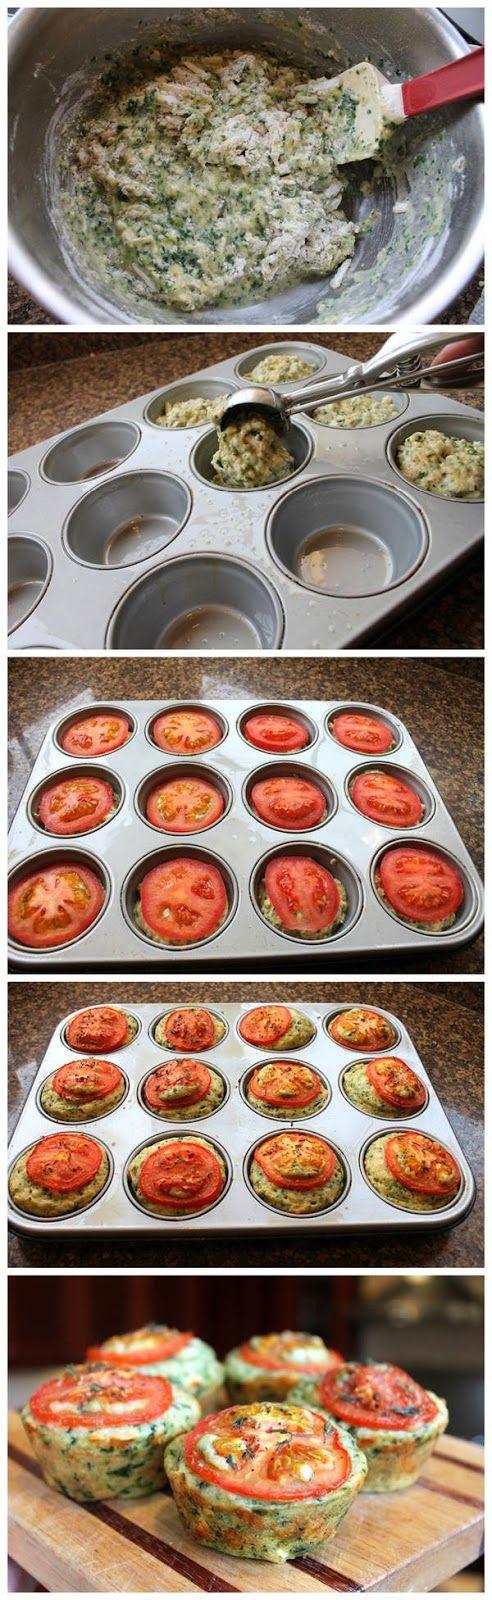 Cheesy Spinach Muffins - RedStarRecipe